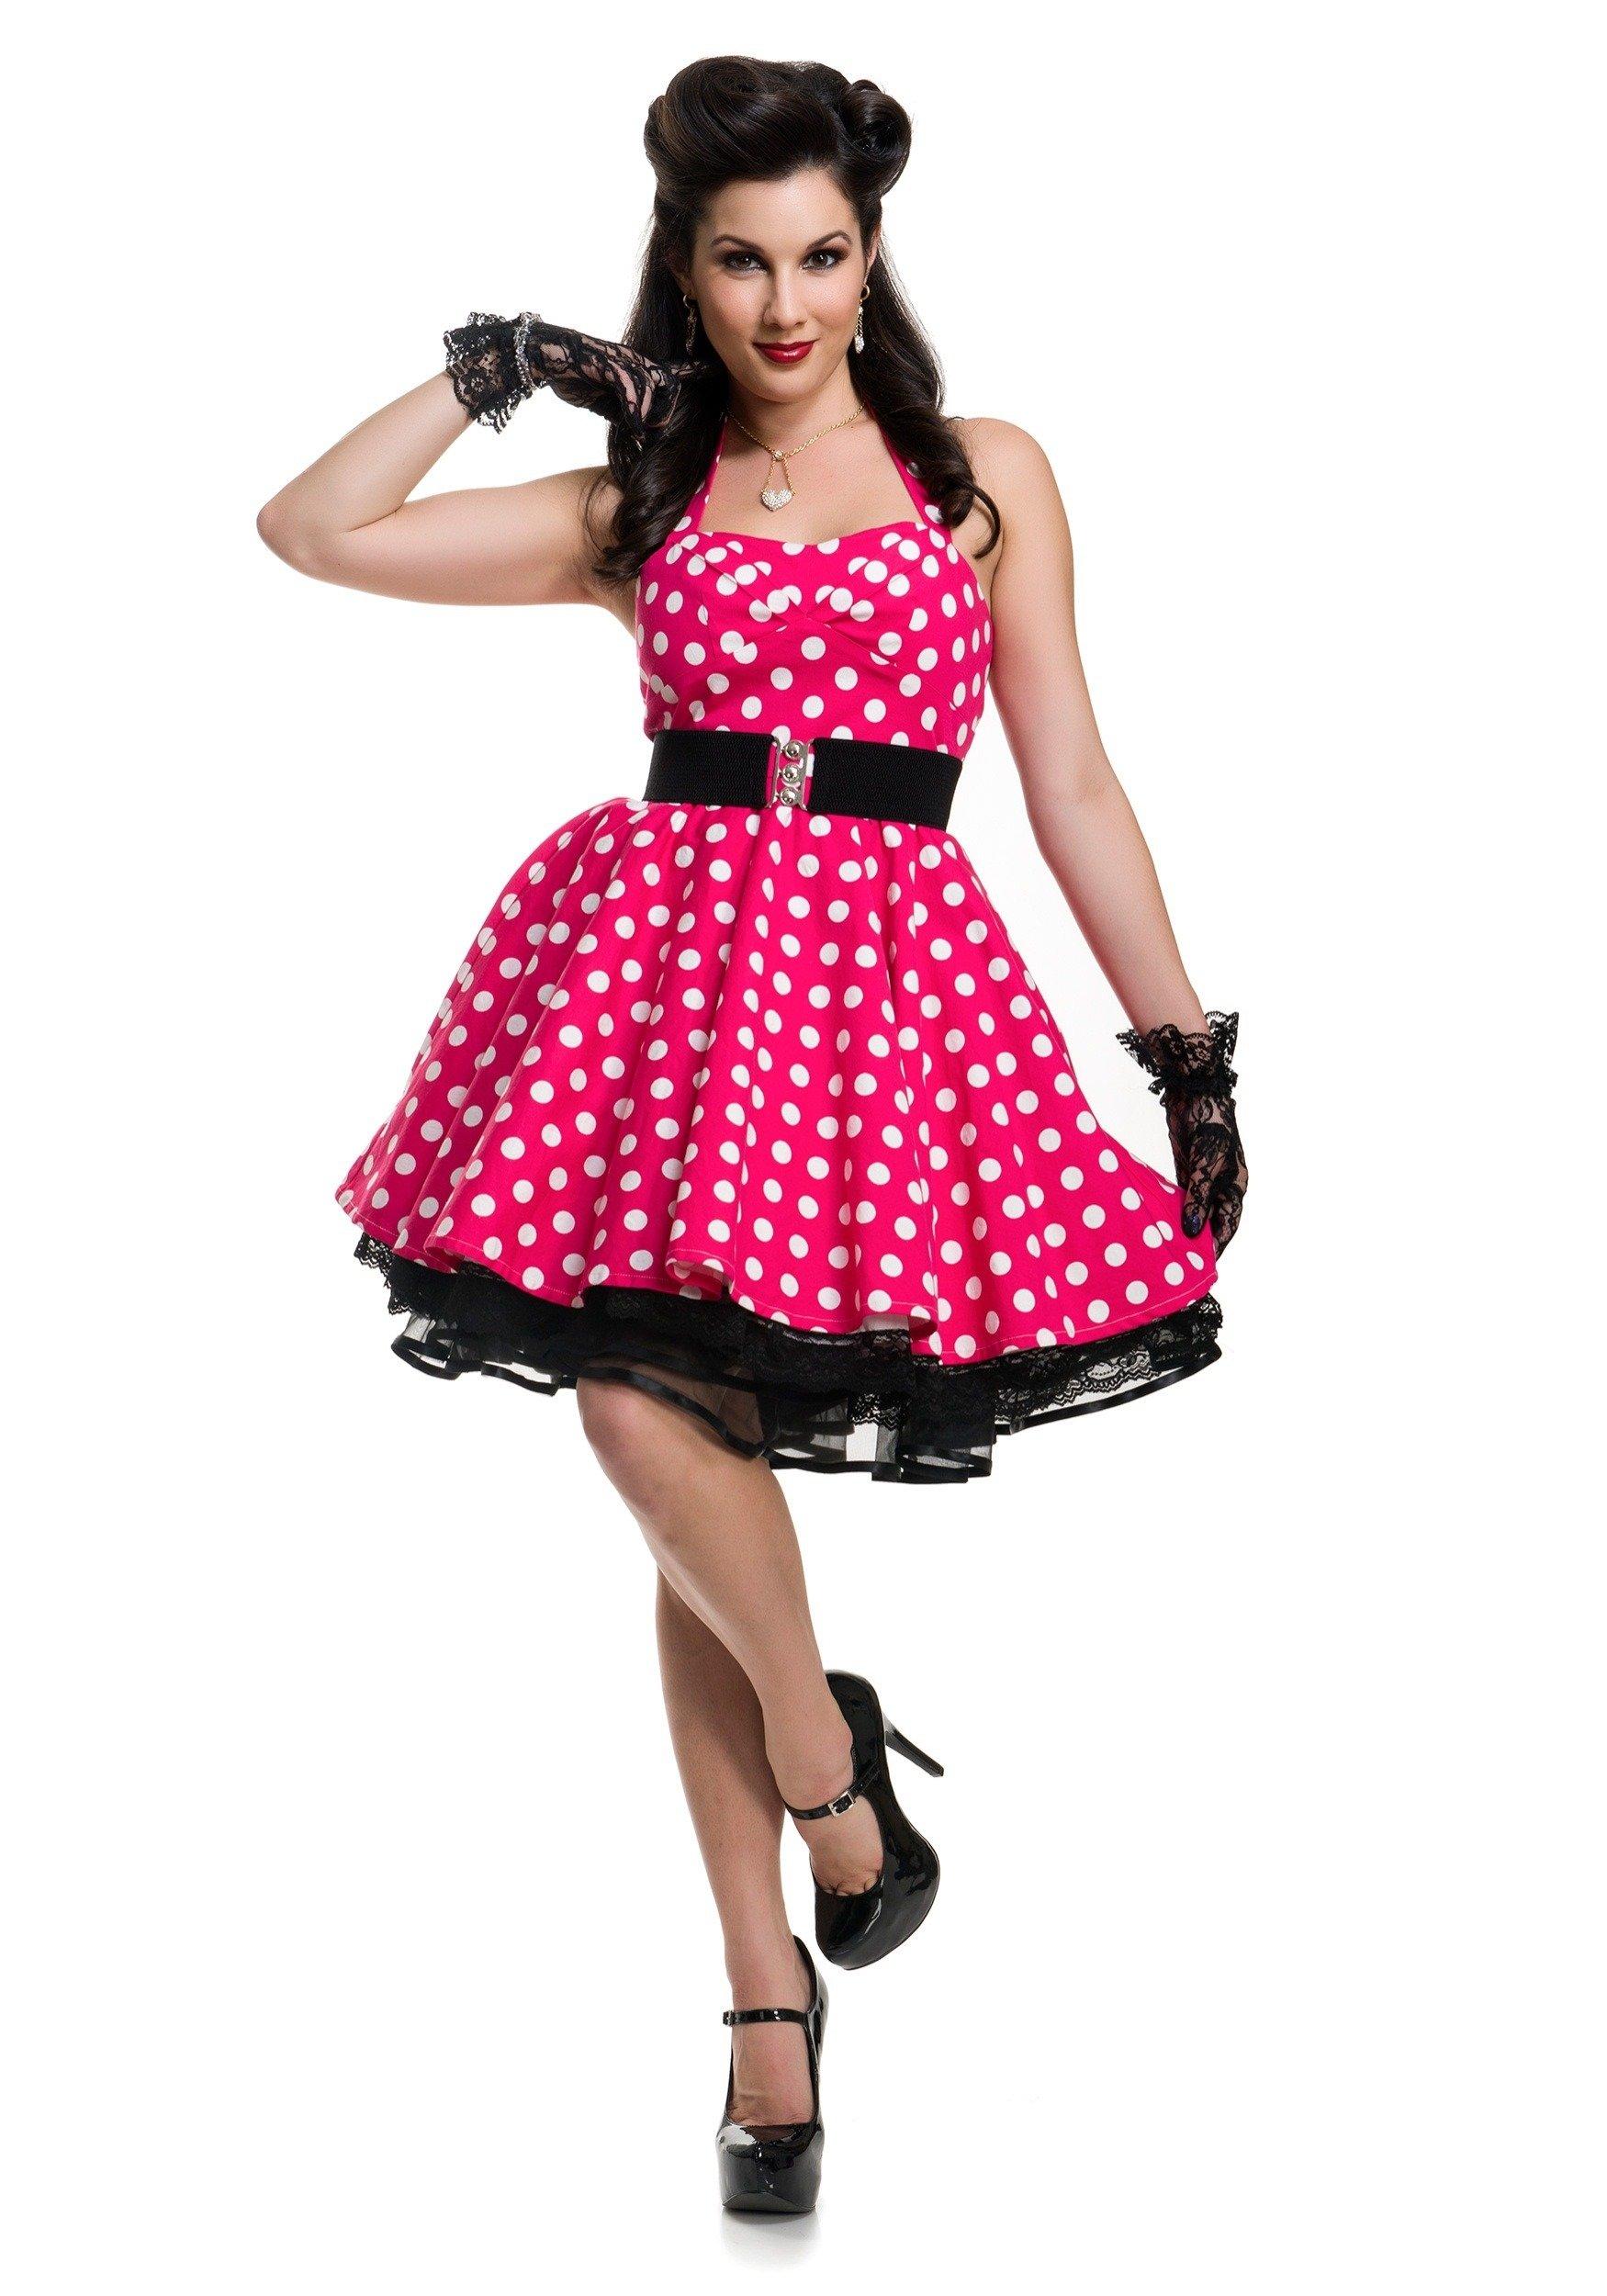 ee1277f8c25 Polka Dot Dress Halloween Costume & Minnie Mouse Dress Halloween ...